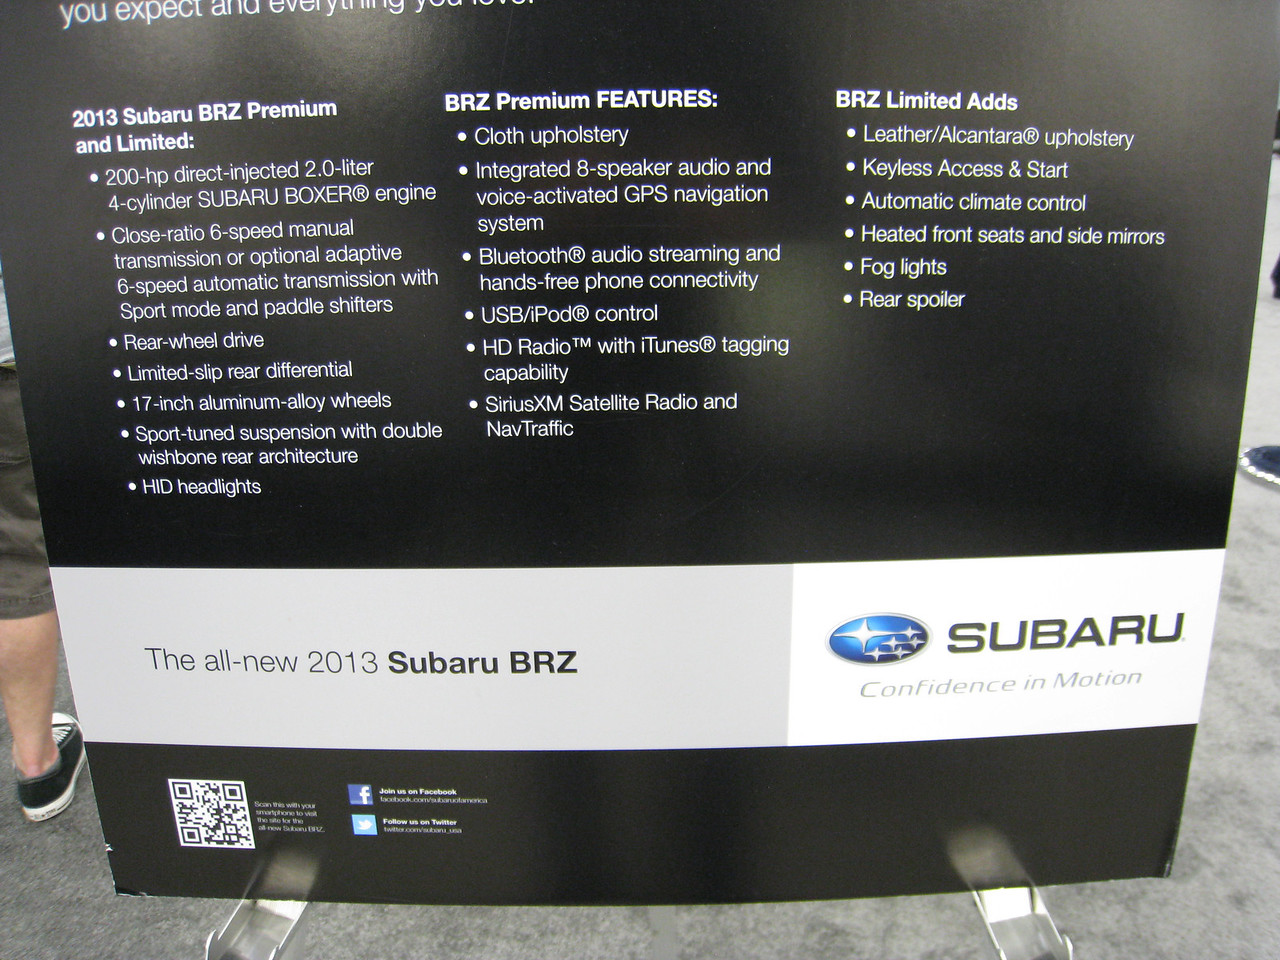 2013 Subaru BRZ model features